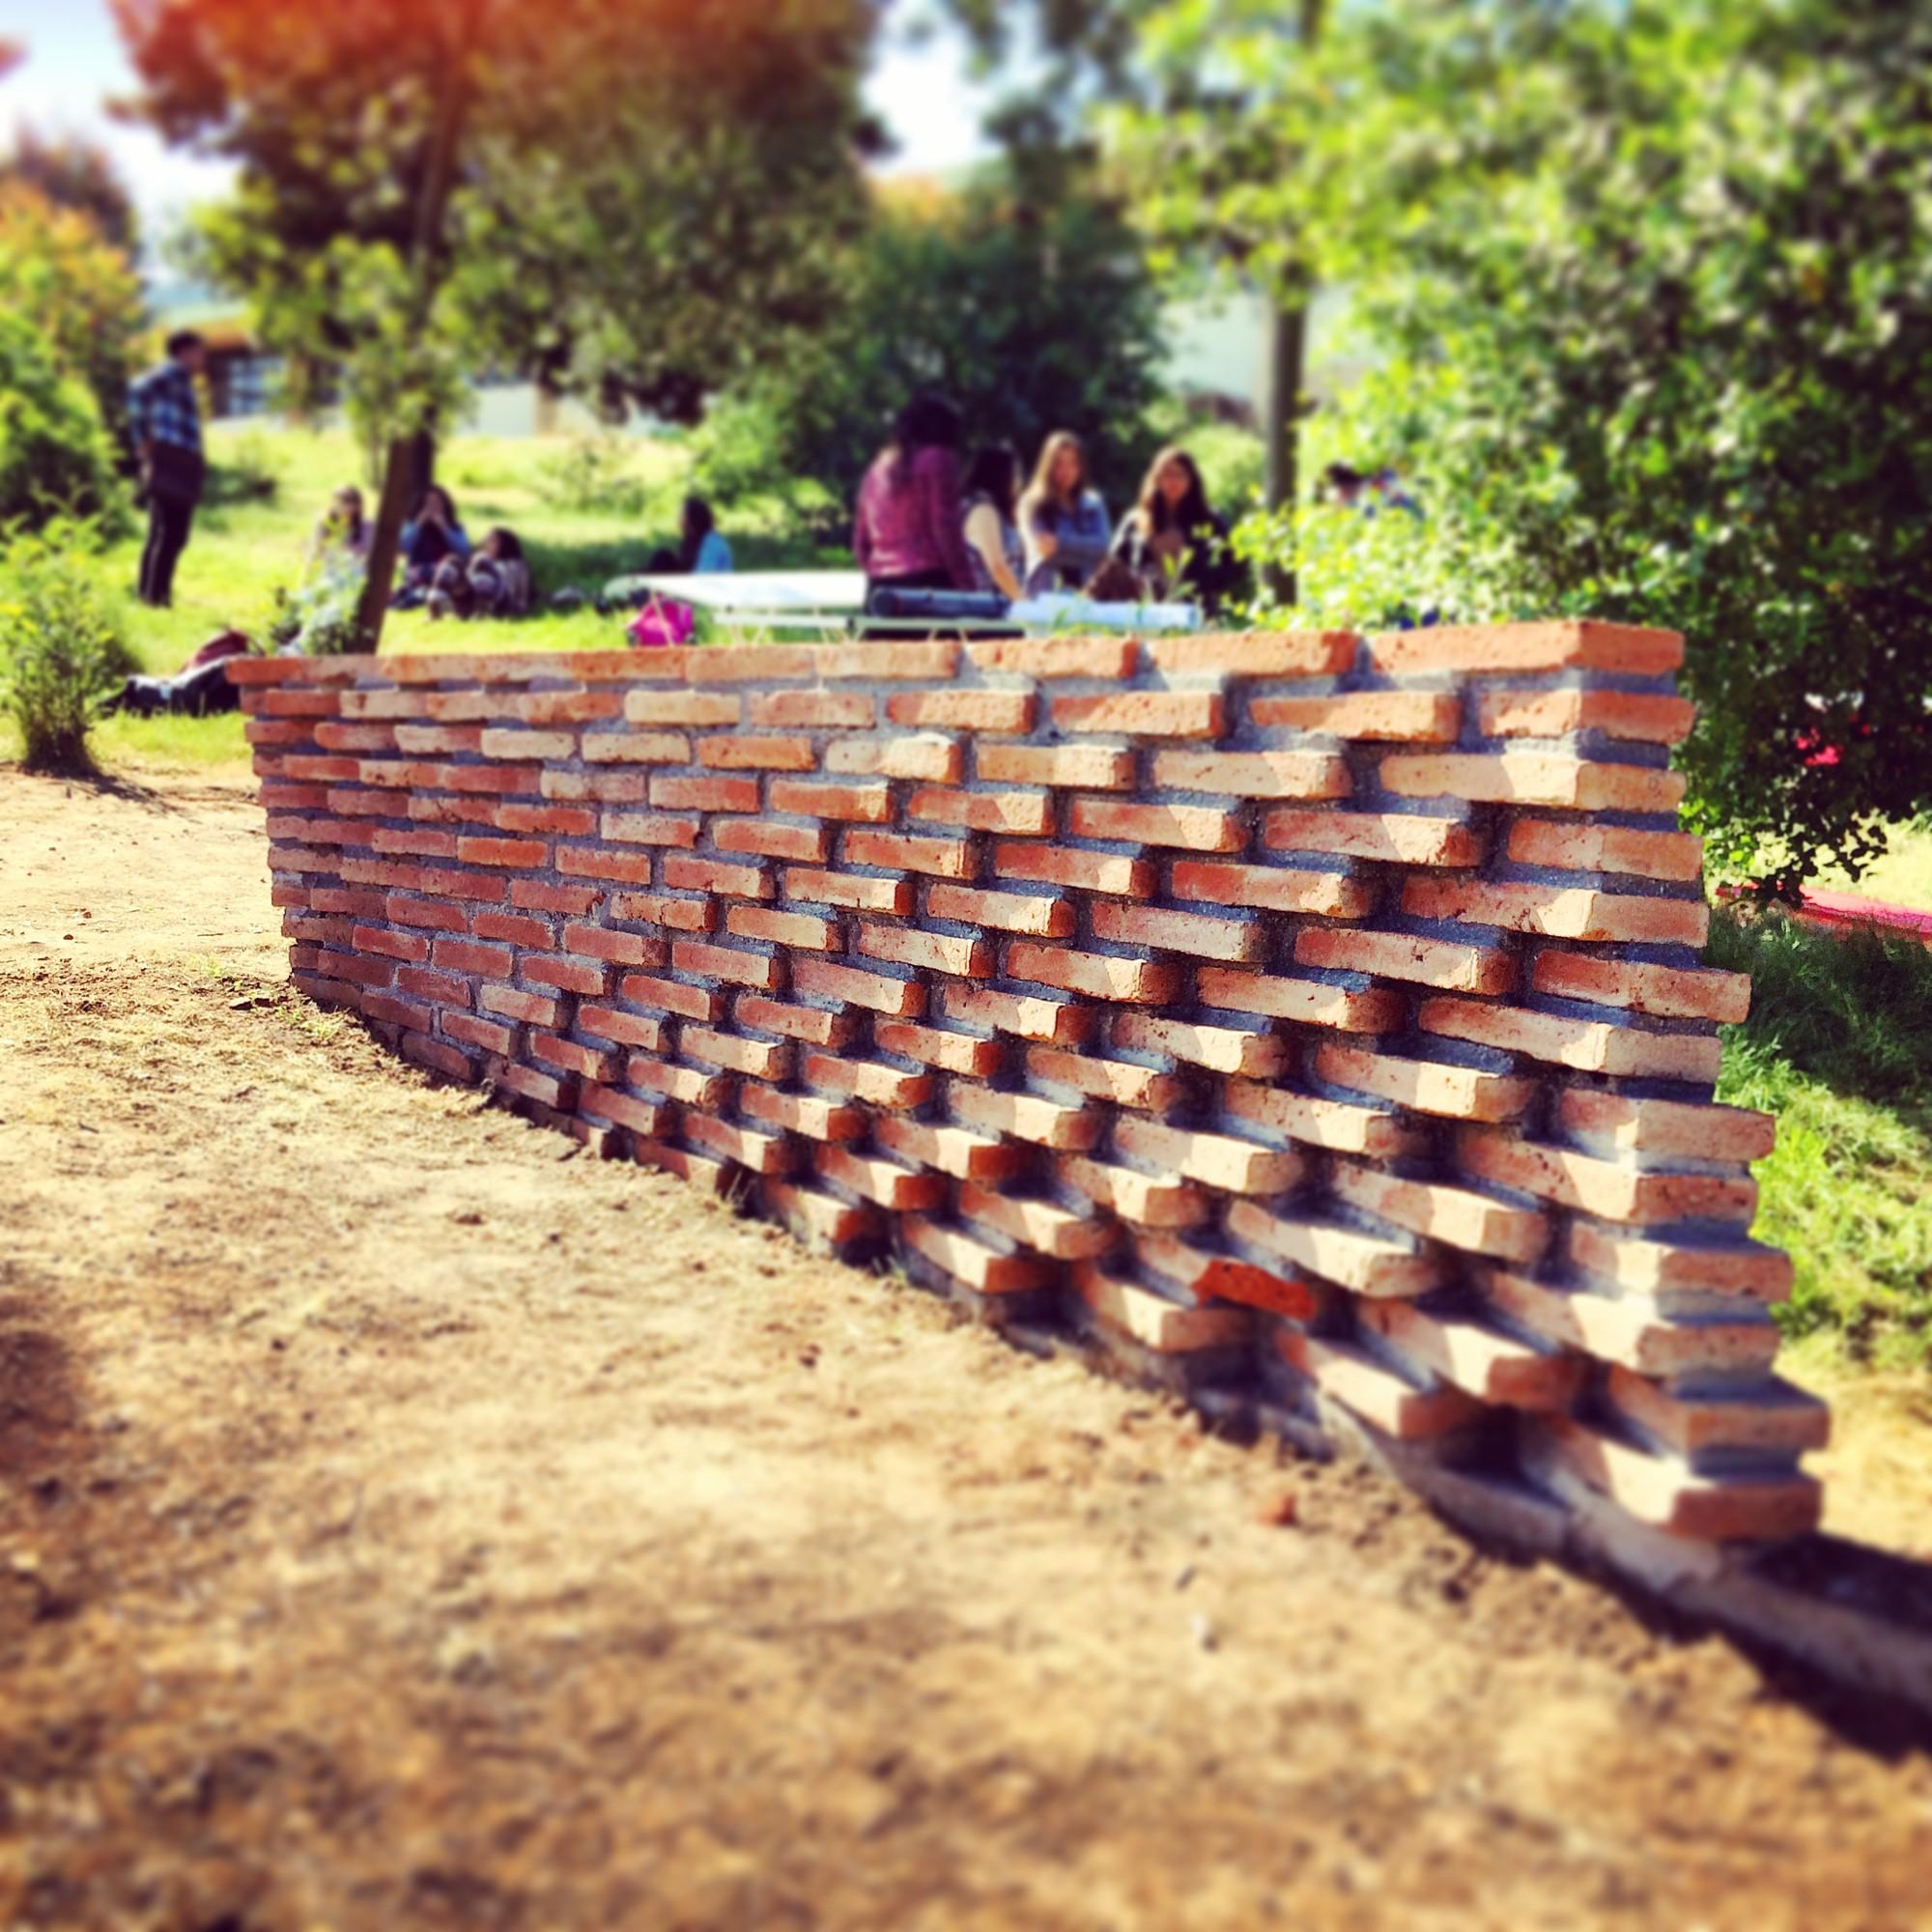 Estudiantes construyen muros de ladrillo en disposición algorítmica, Inauguración: Grupo 2. Image Cortesia de Verónica Arcos